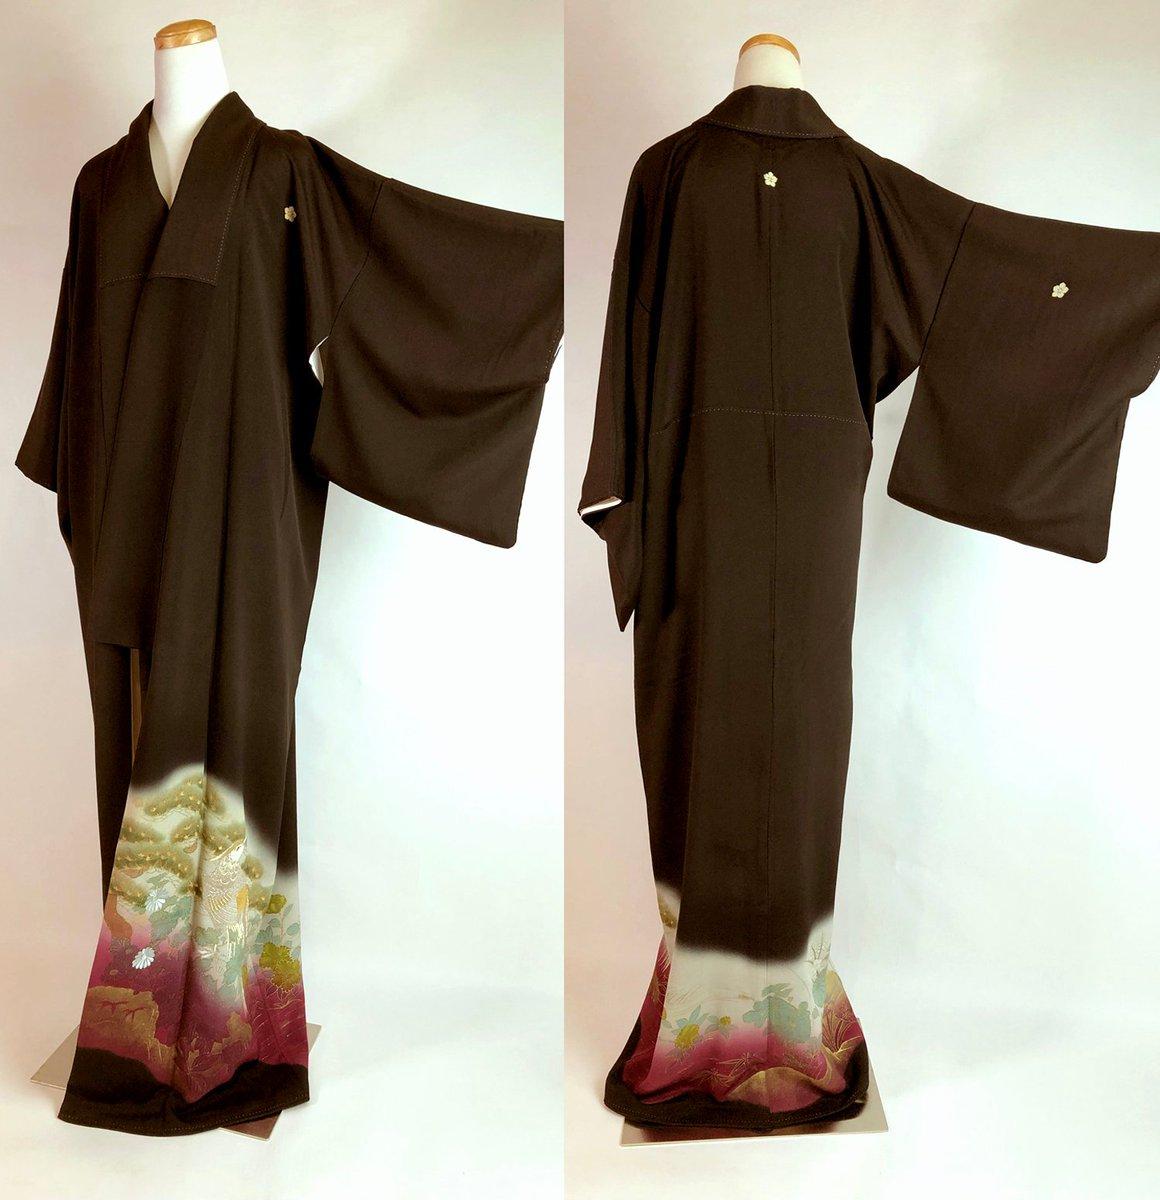 14dffd6eee4 ... shop  Japanese E112502 Elegant Kyo-Yuzen   Embroidery Kuro Tomesode  Kimono Vintage https   etsy.me 2BweMsg  clothing  costume  women  black   purple ...